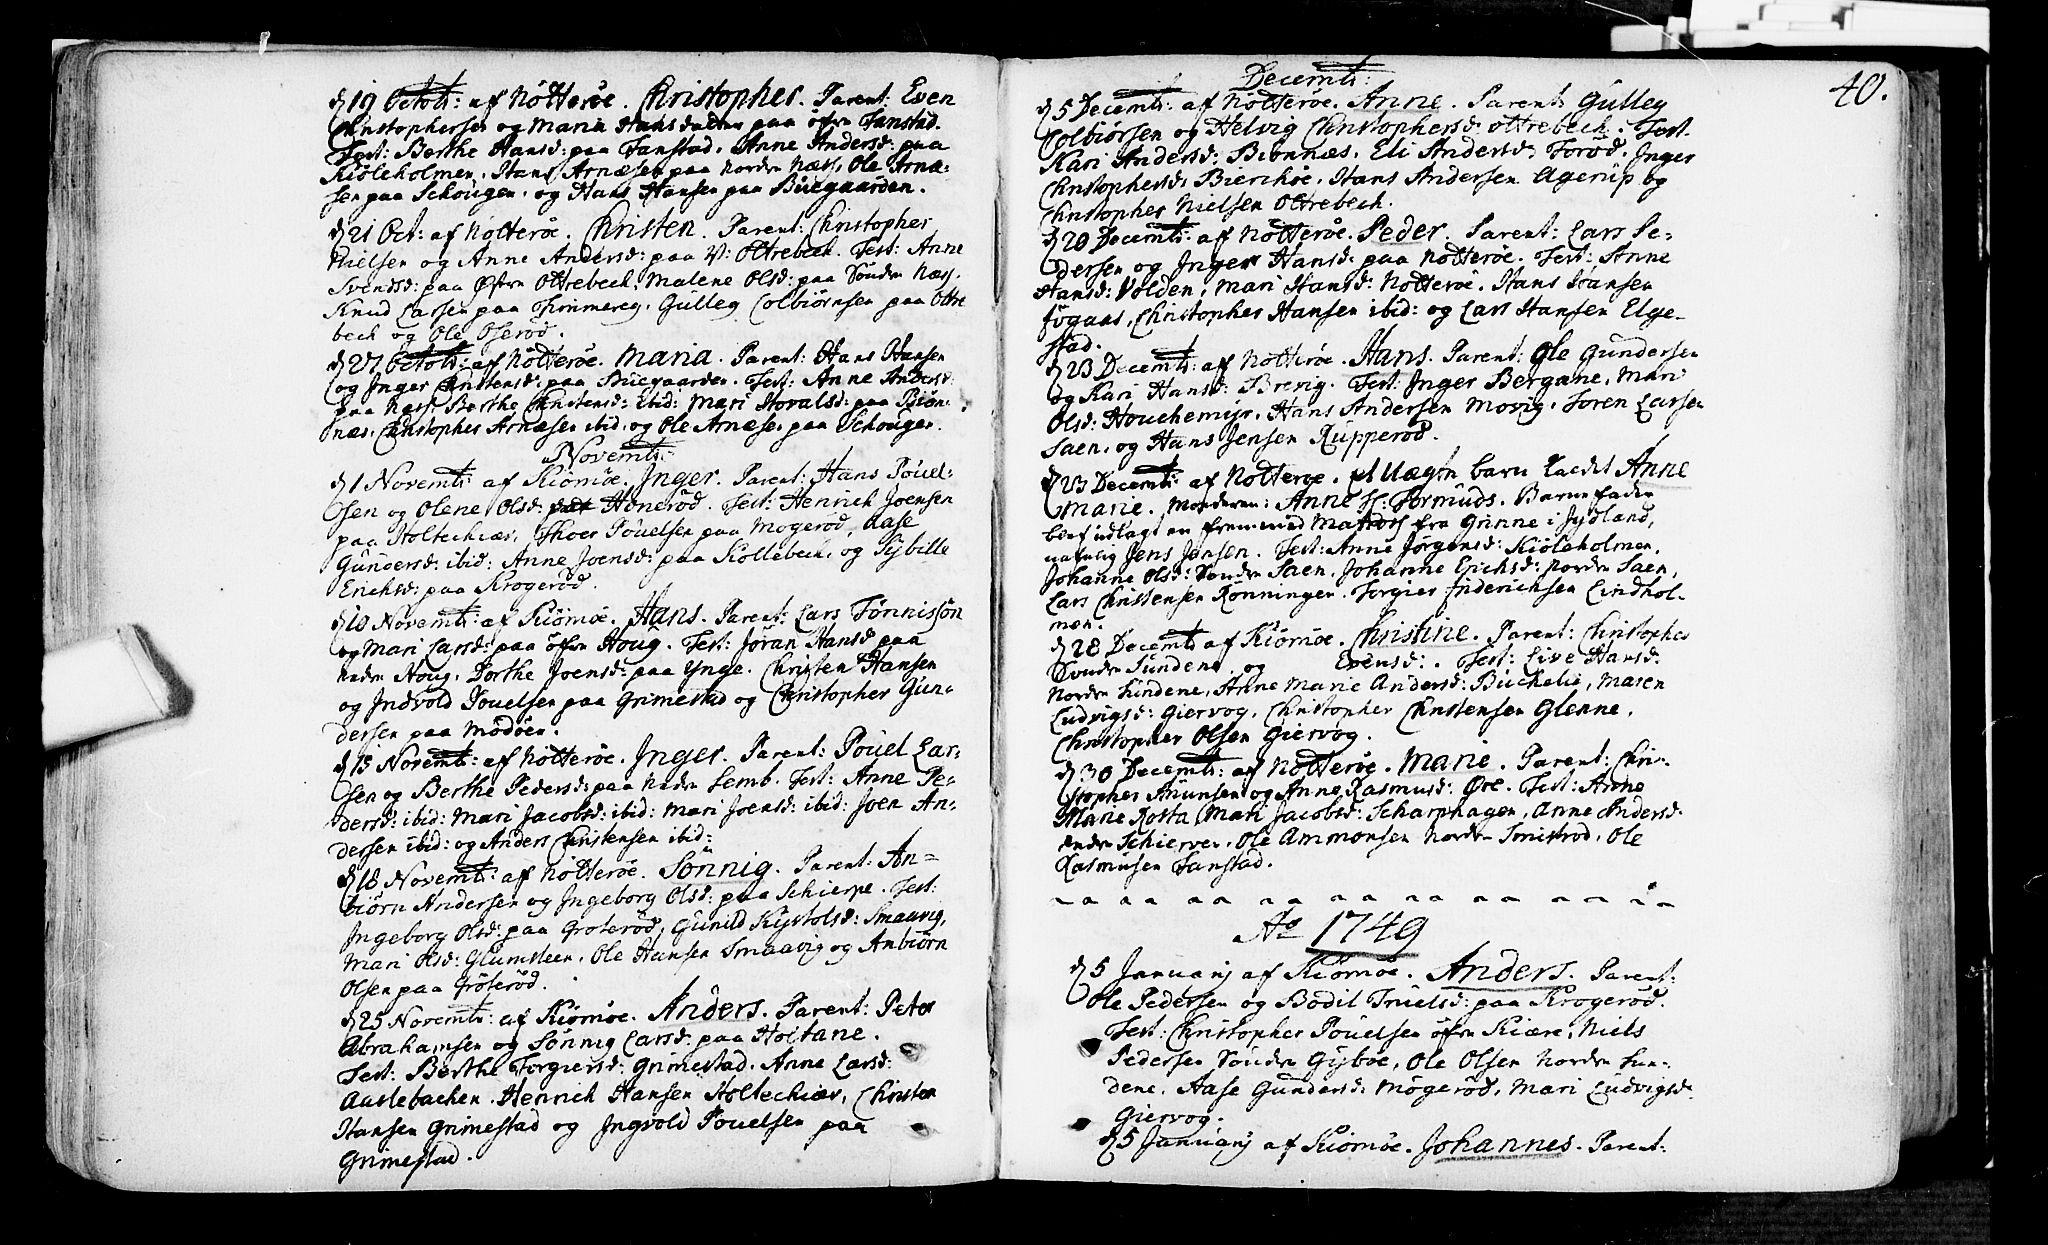 SAKO, Nøtterøy kirkebøker, F/Fa/L0002: Ministerialbok nr. I 2, 1738-1790, s. 40